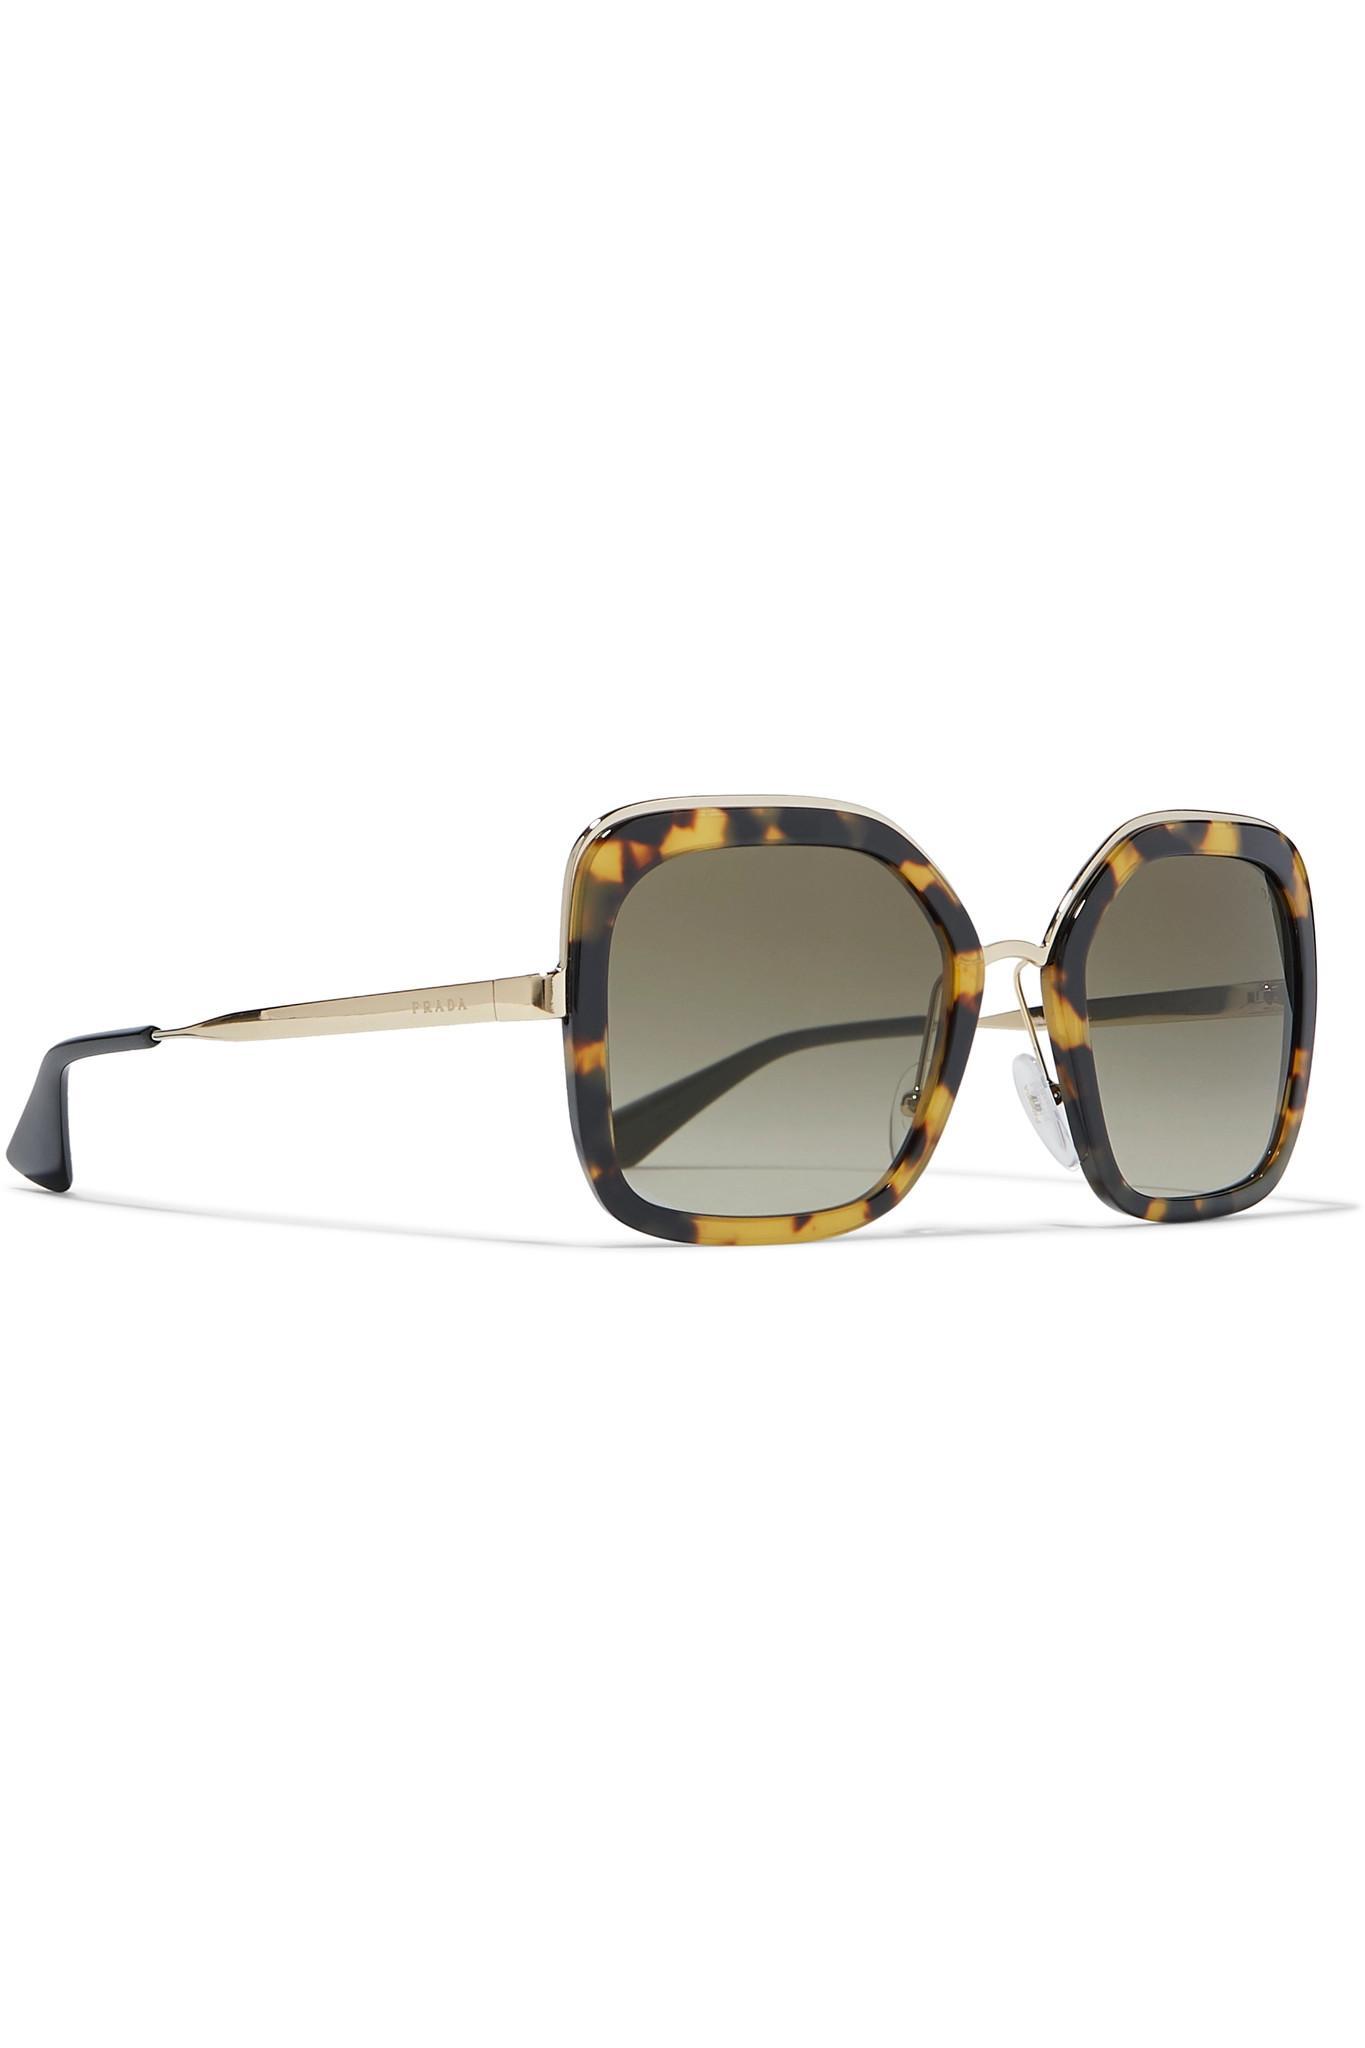 Tortoiseshell Frame Acetate Tone Prada And Lyst Gold Sunglasses Square 8nOm0vwPyN